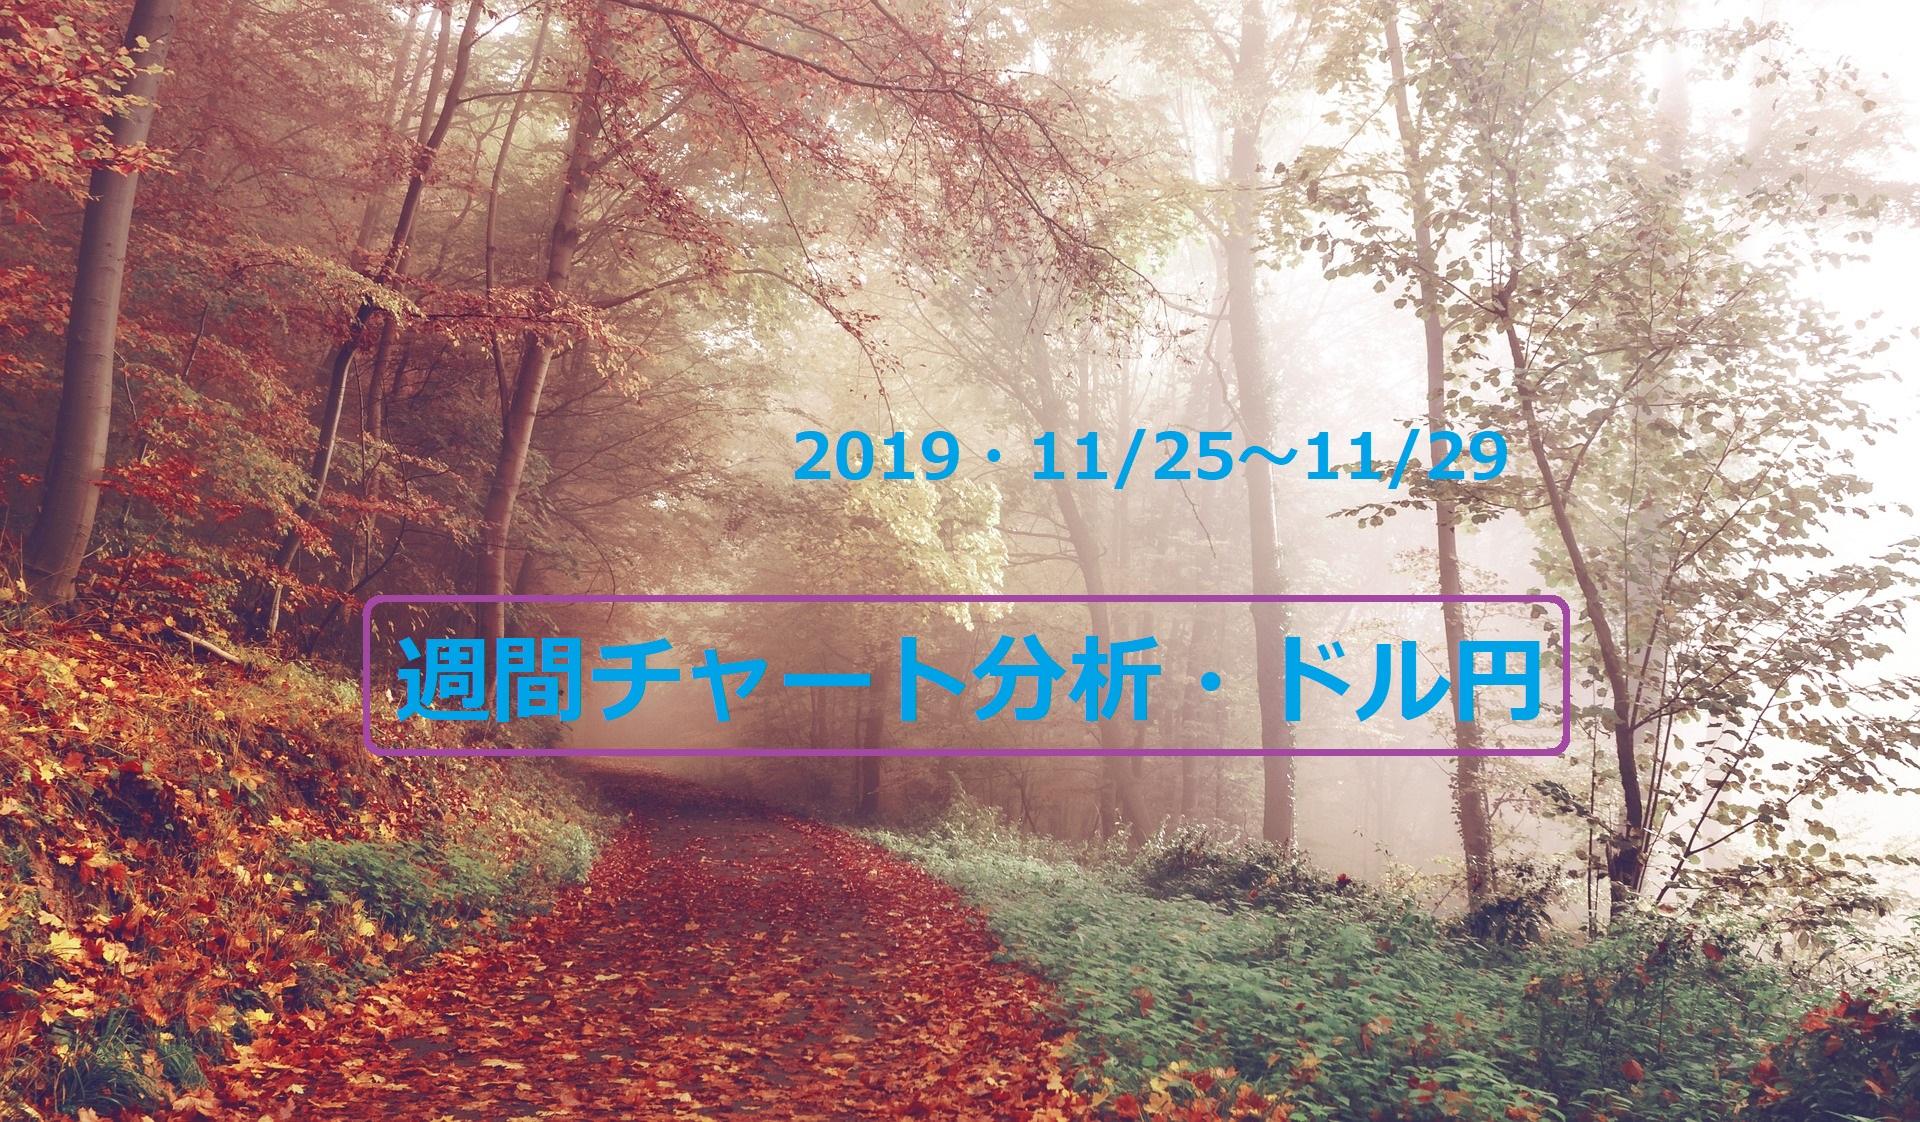 【FX】週間チャート分析・ドル円【2019・11/25~11/29】